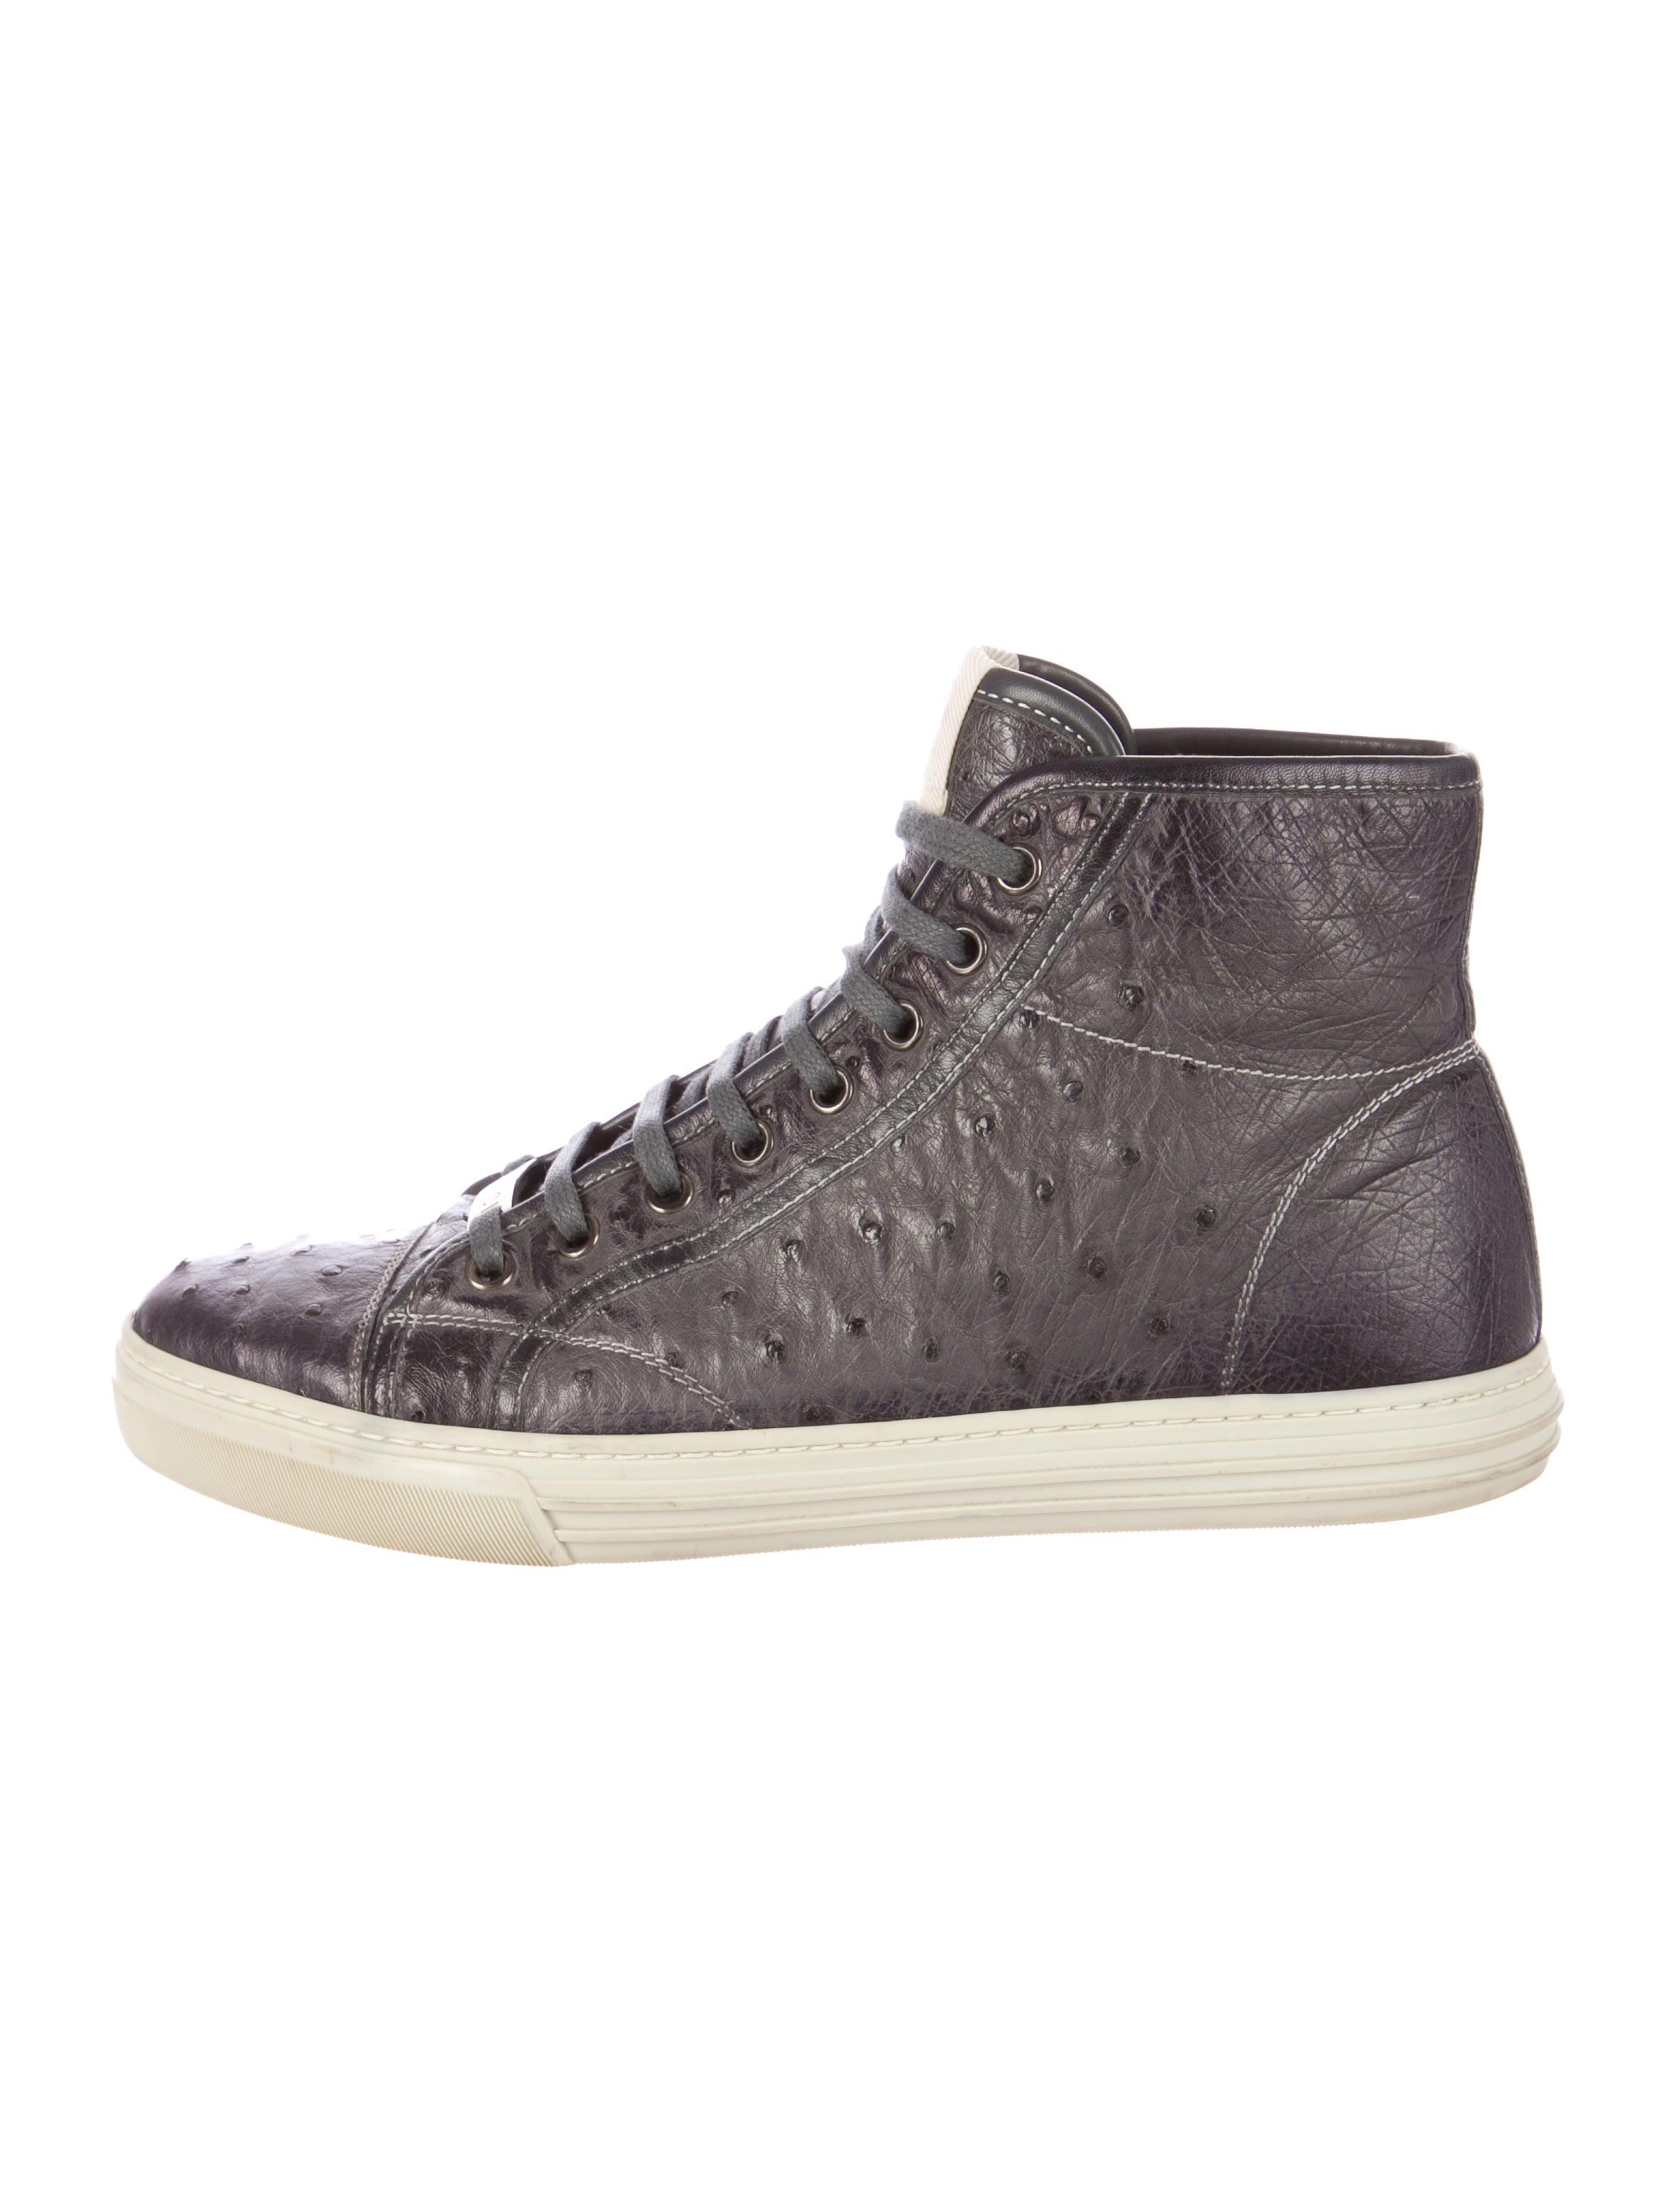 Mens Gucci Ostrich Shoes